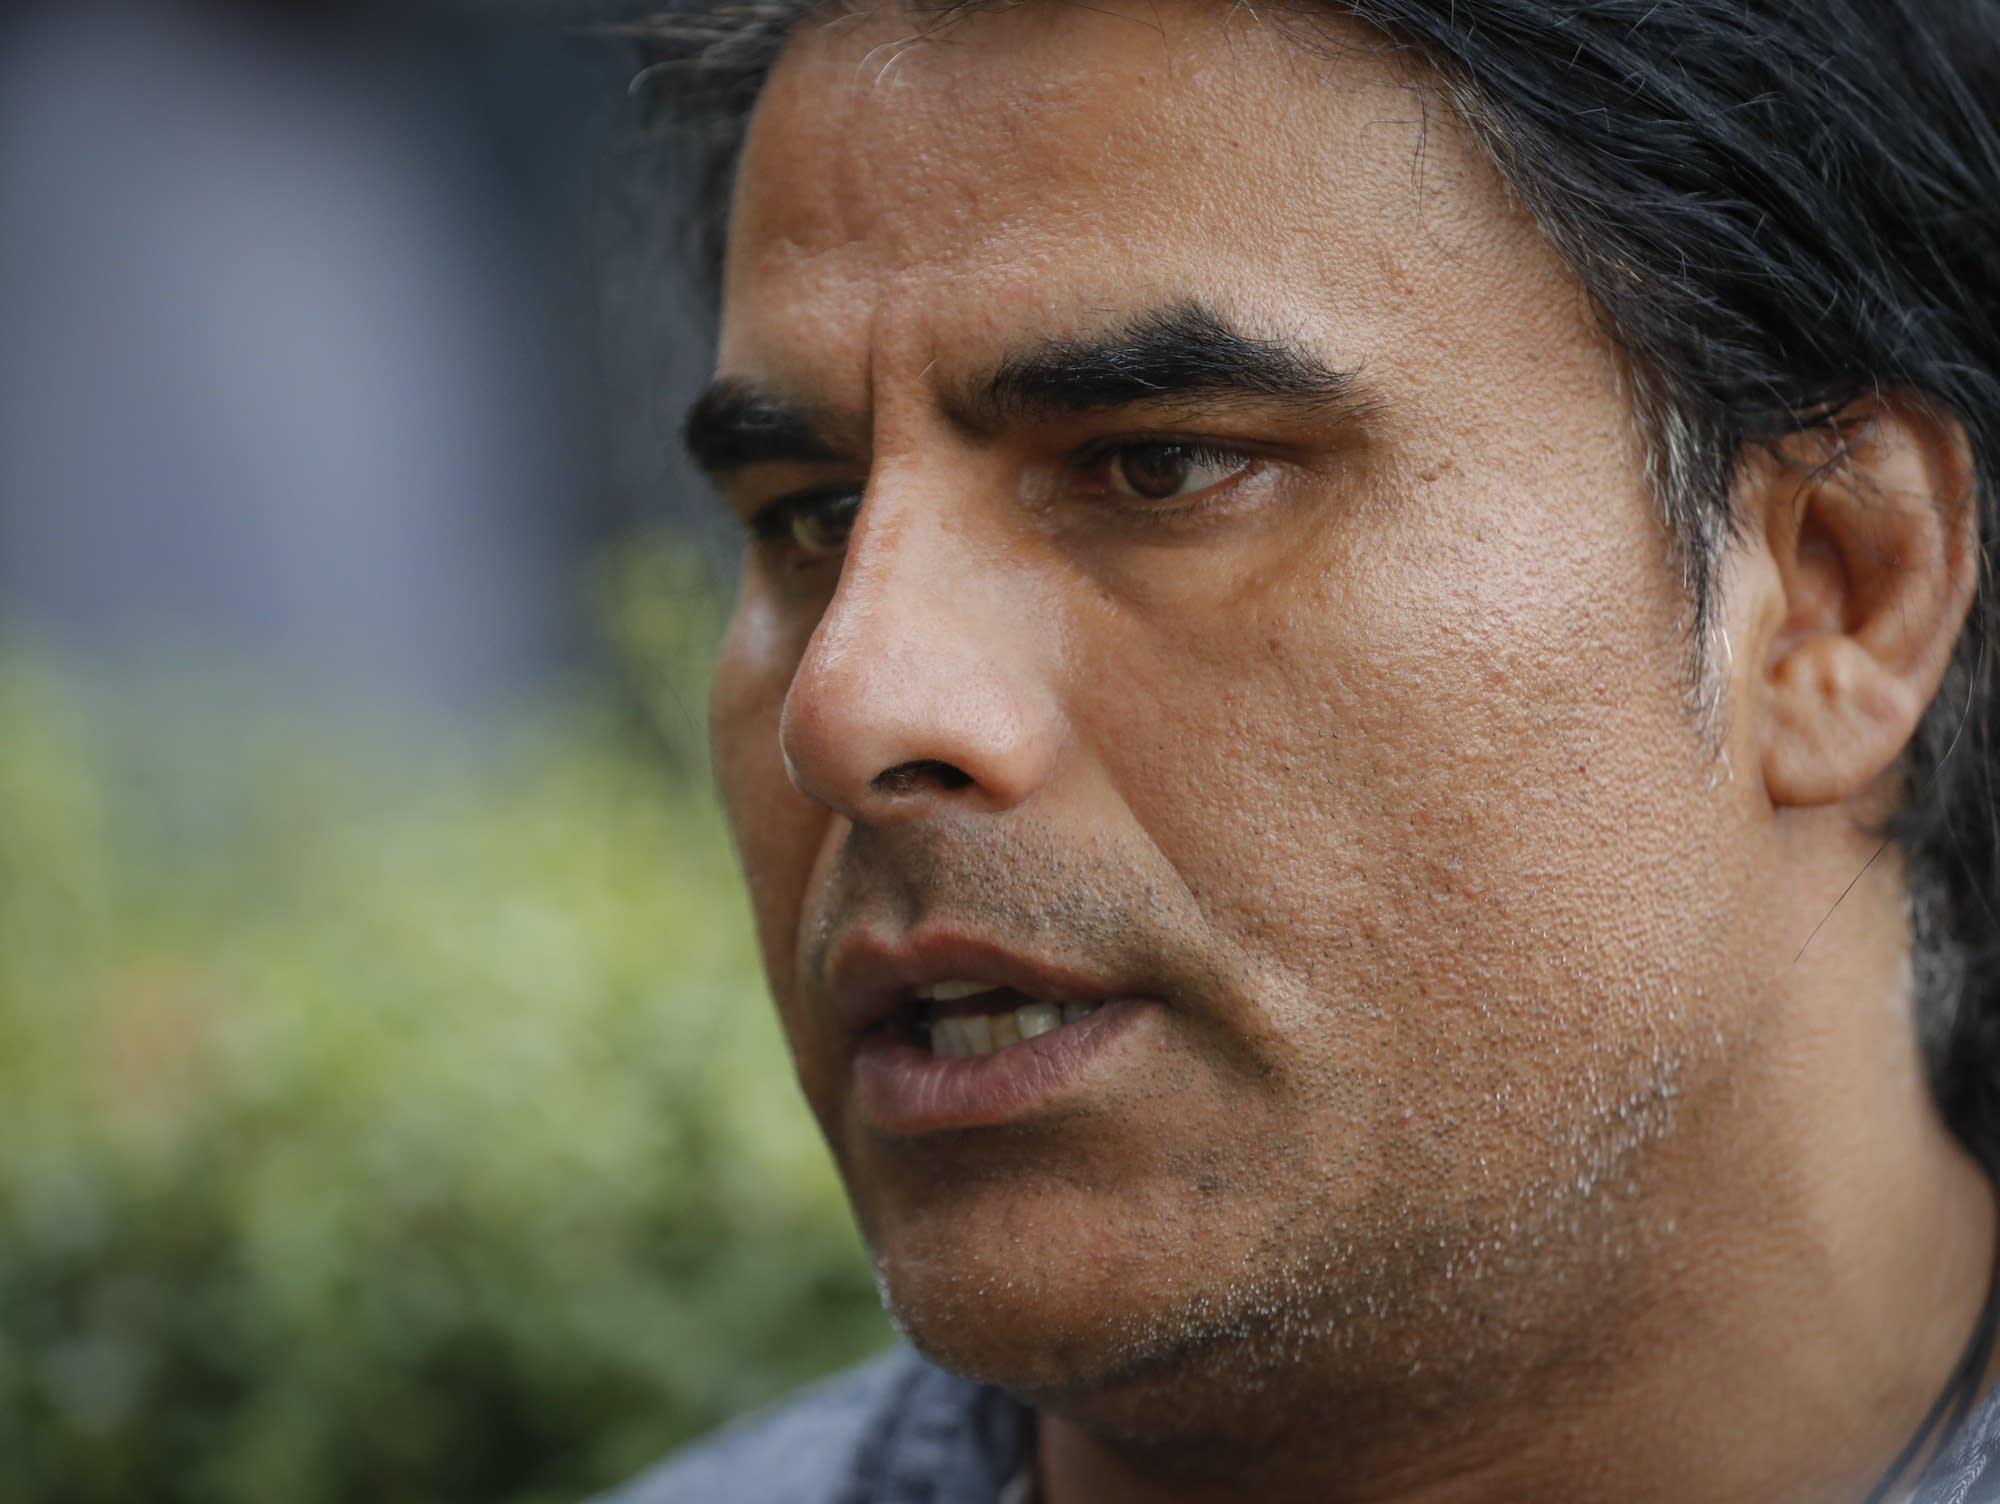 Abdul Aziz, a survivor of the mosque shootings in New Zealand